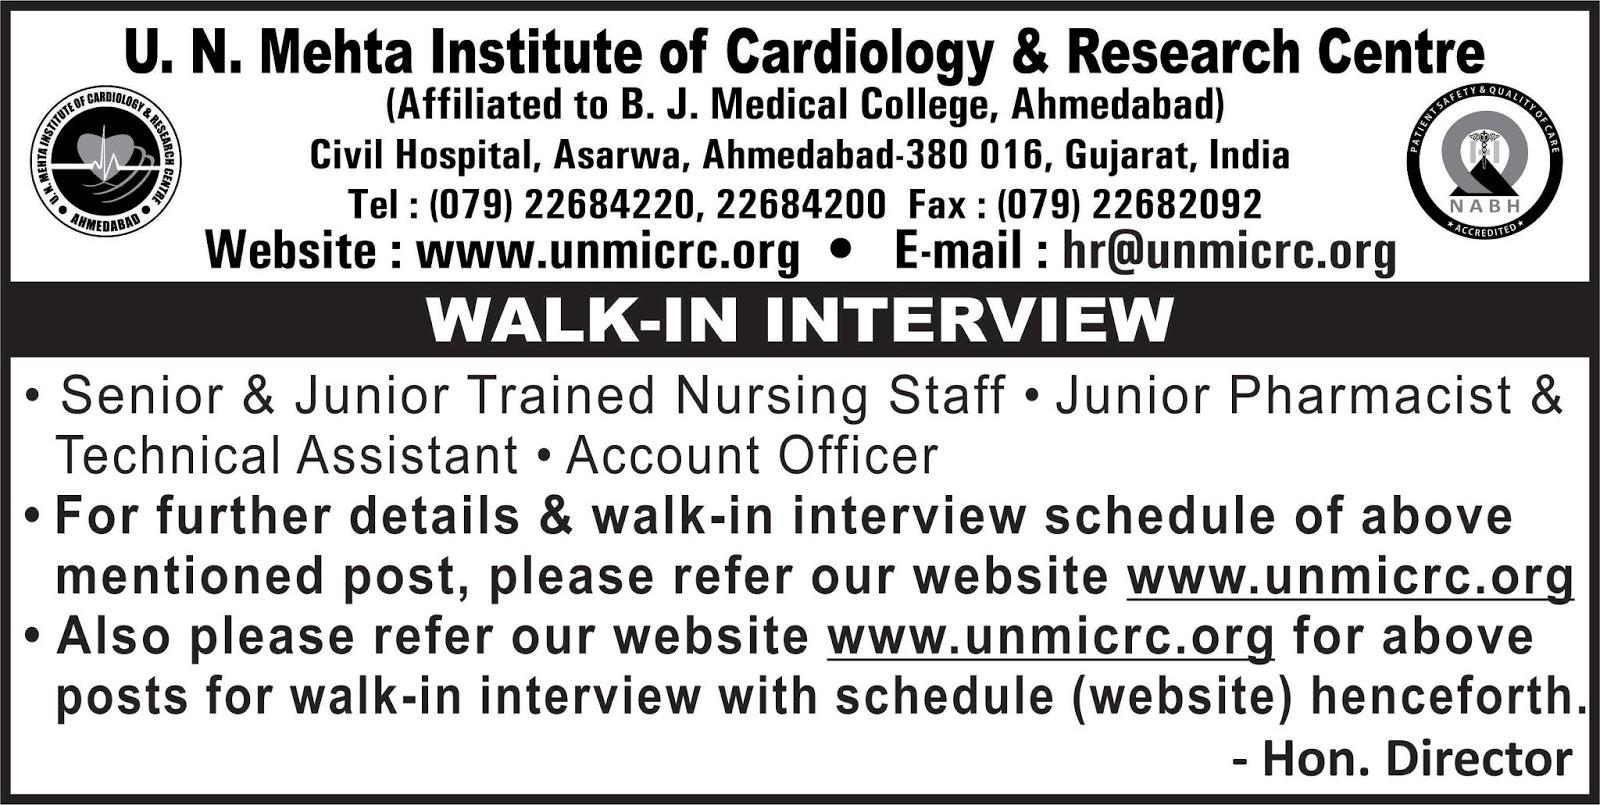 Cardiology telegram channel. telegram channels list 18+ india.